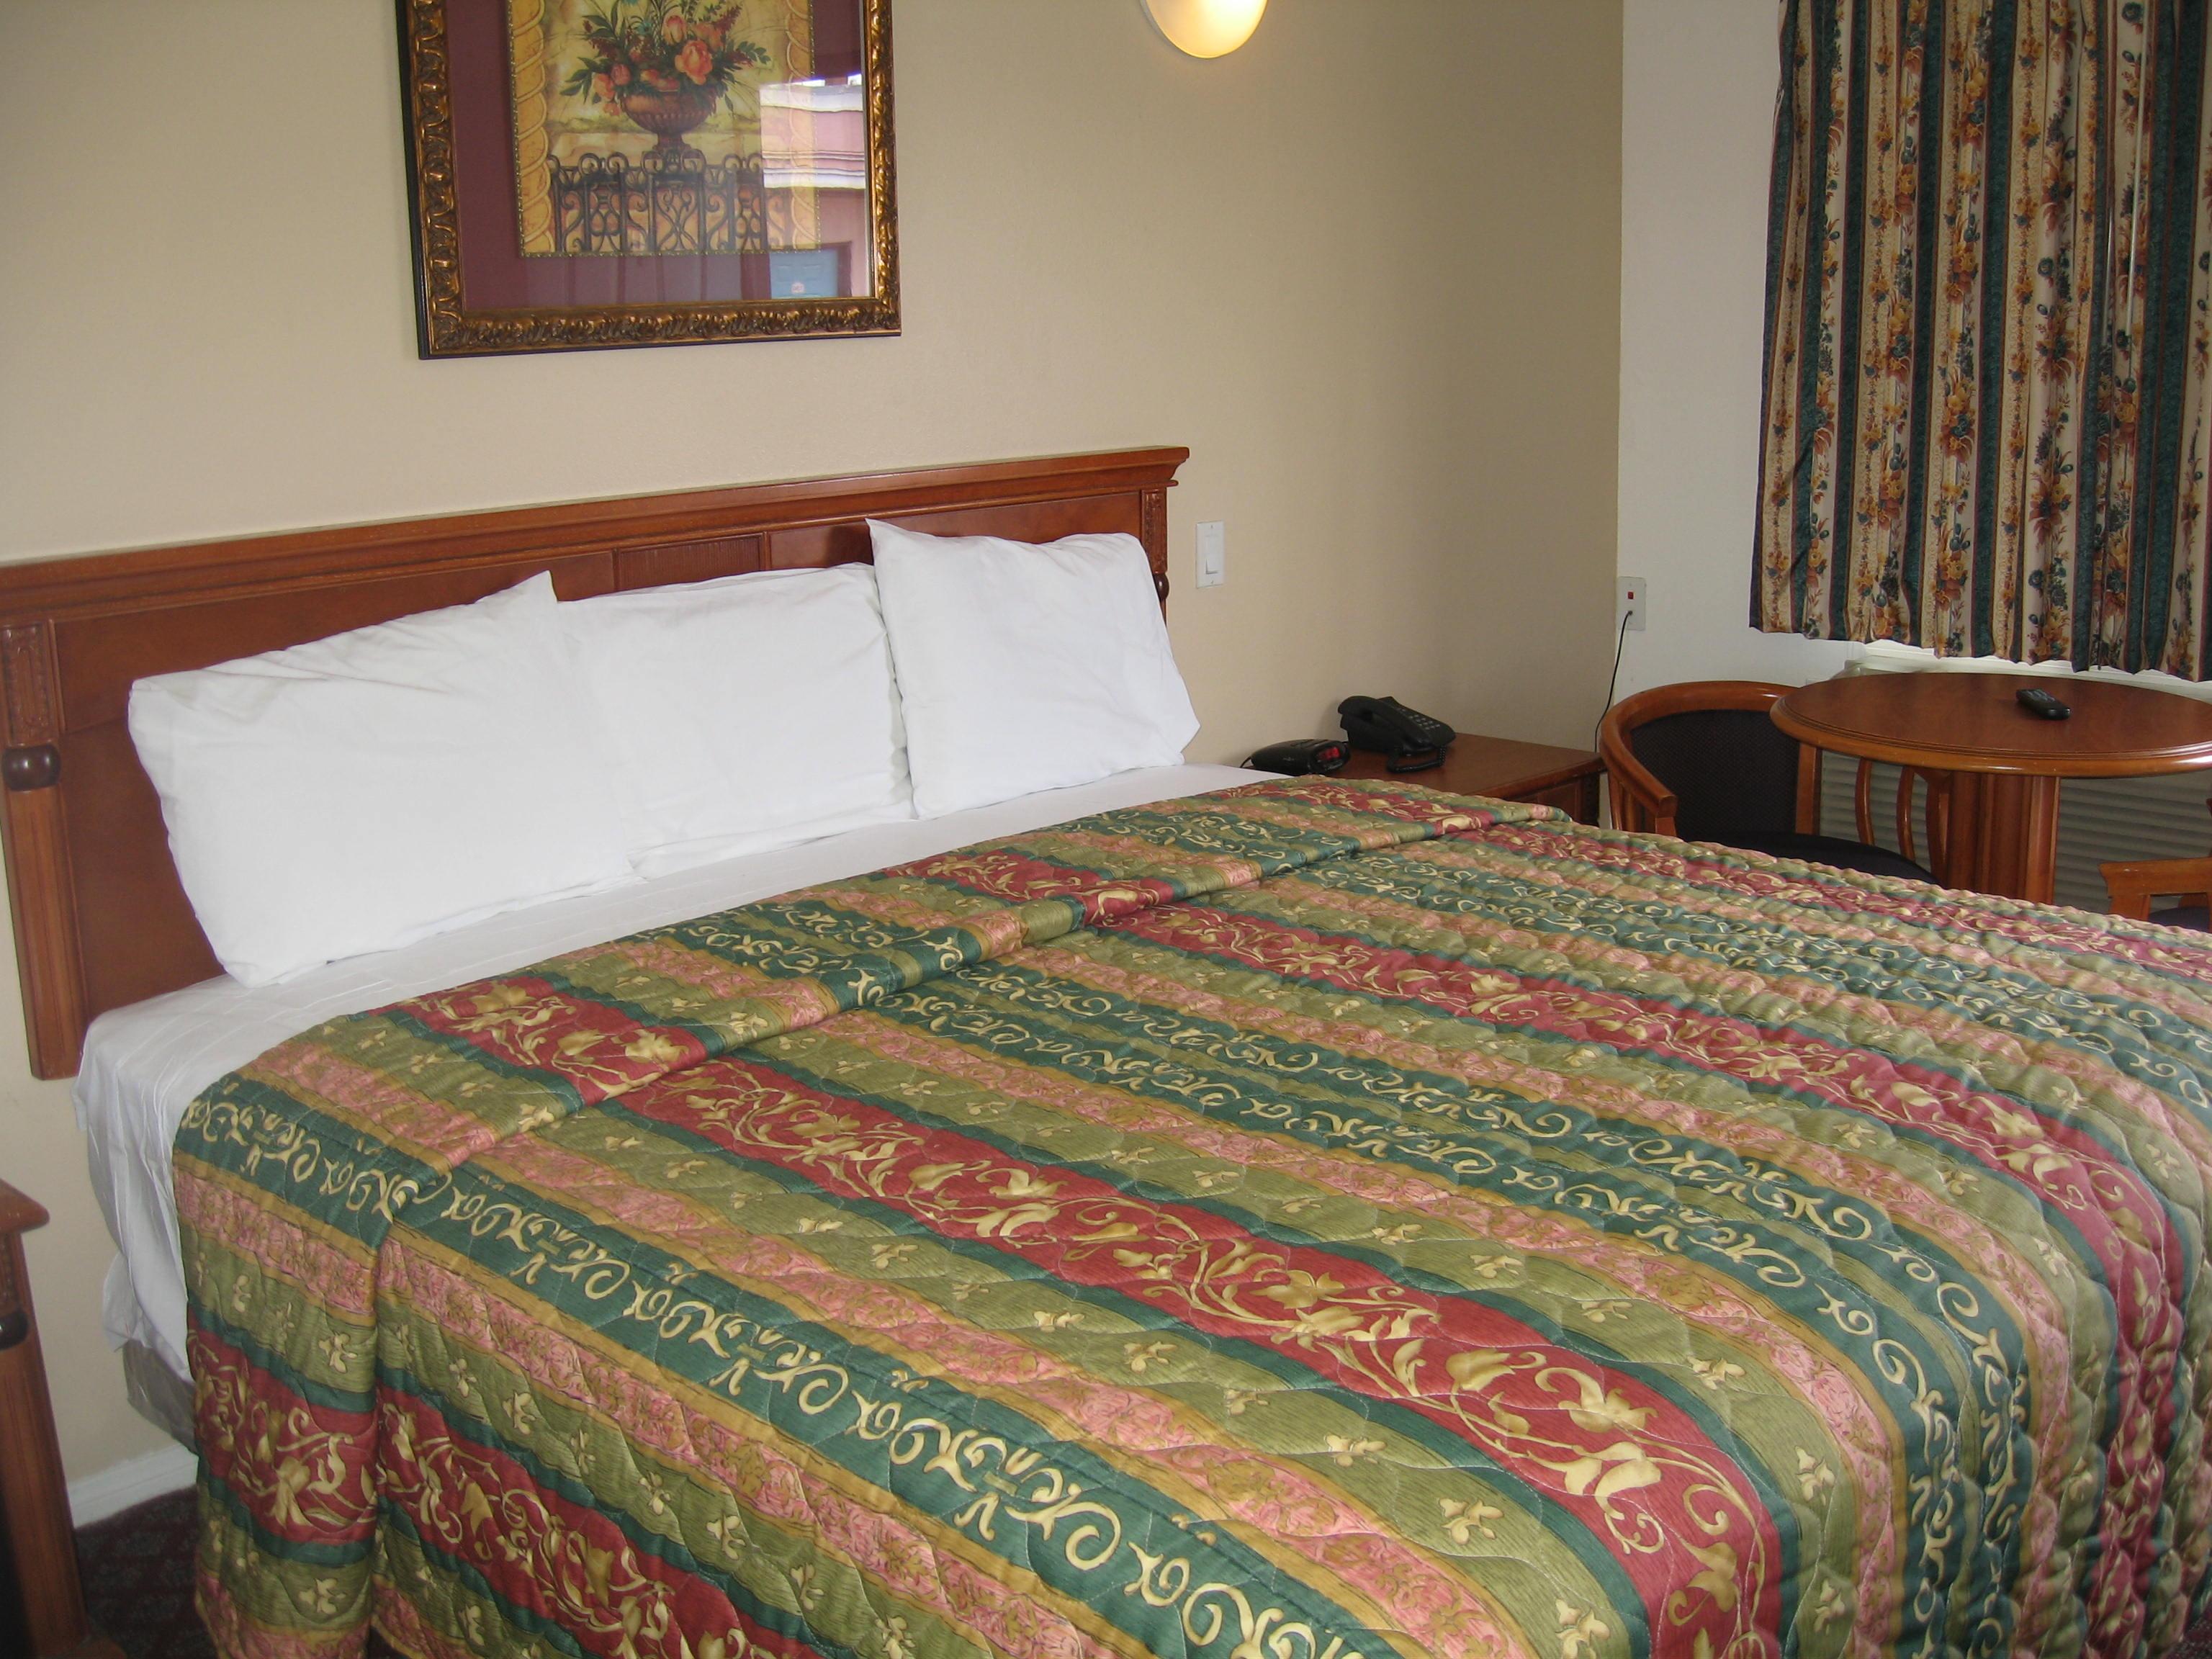 New Motel Pic 004_20140925-11180277.jpg